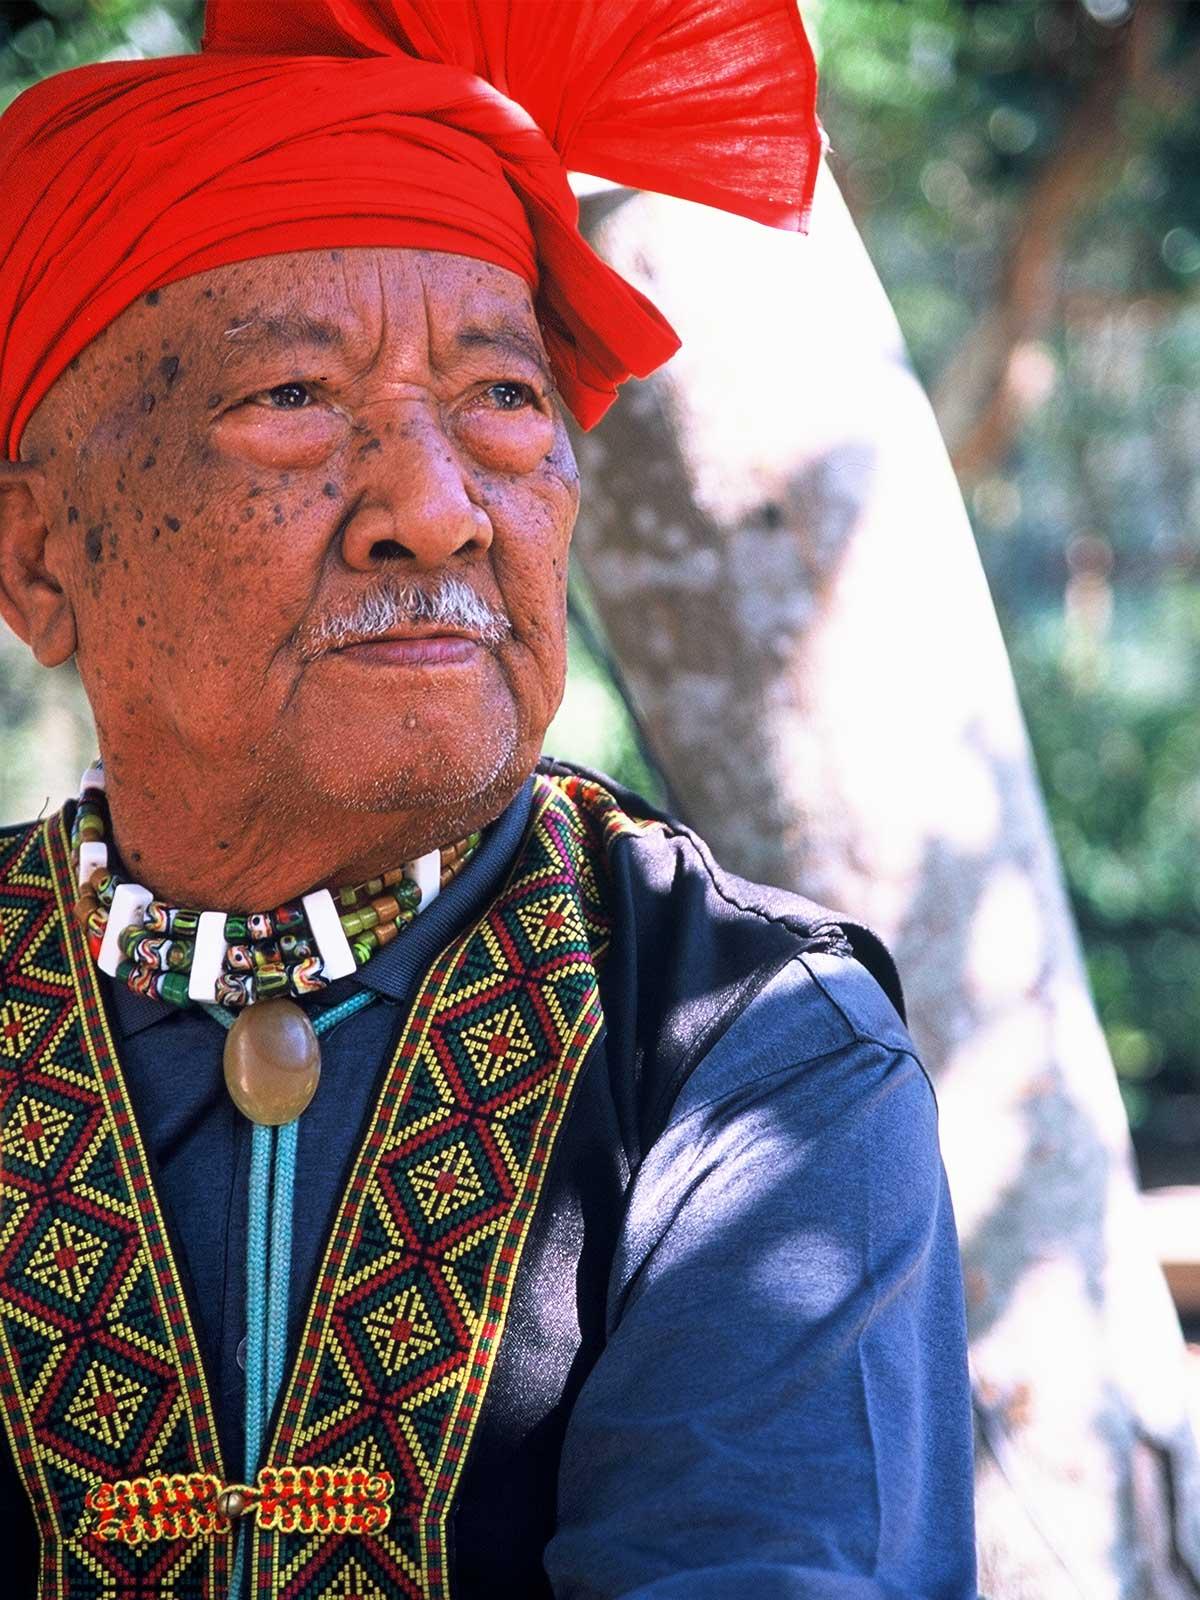 Tama Biung Istanda | Ethnographic Film and Research | Steven Andrew Martin | Laipunuk Bunun | Taiwan Aborigines | Laipunuk 內本鹿 Nei Ben Lu